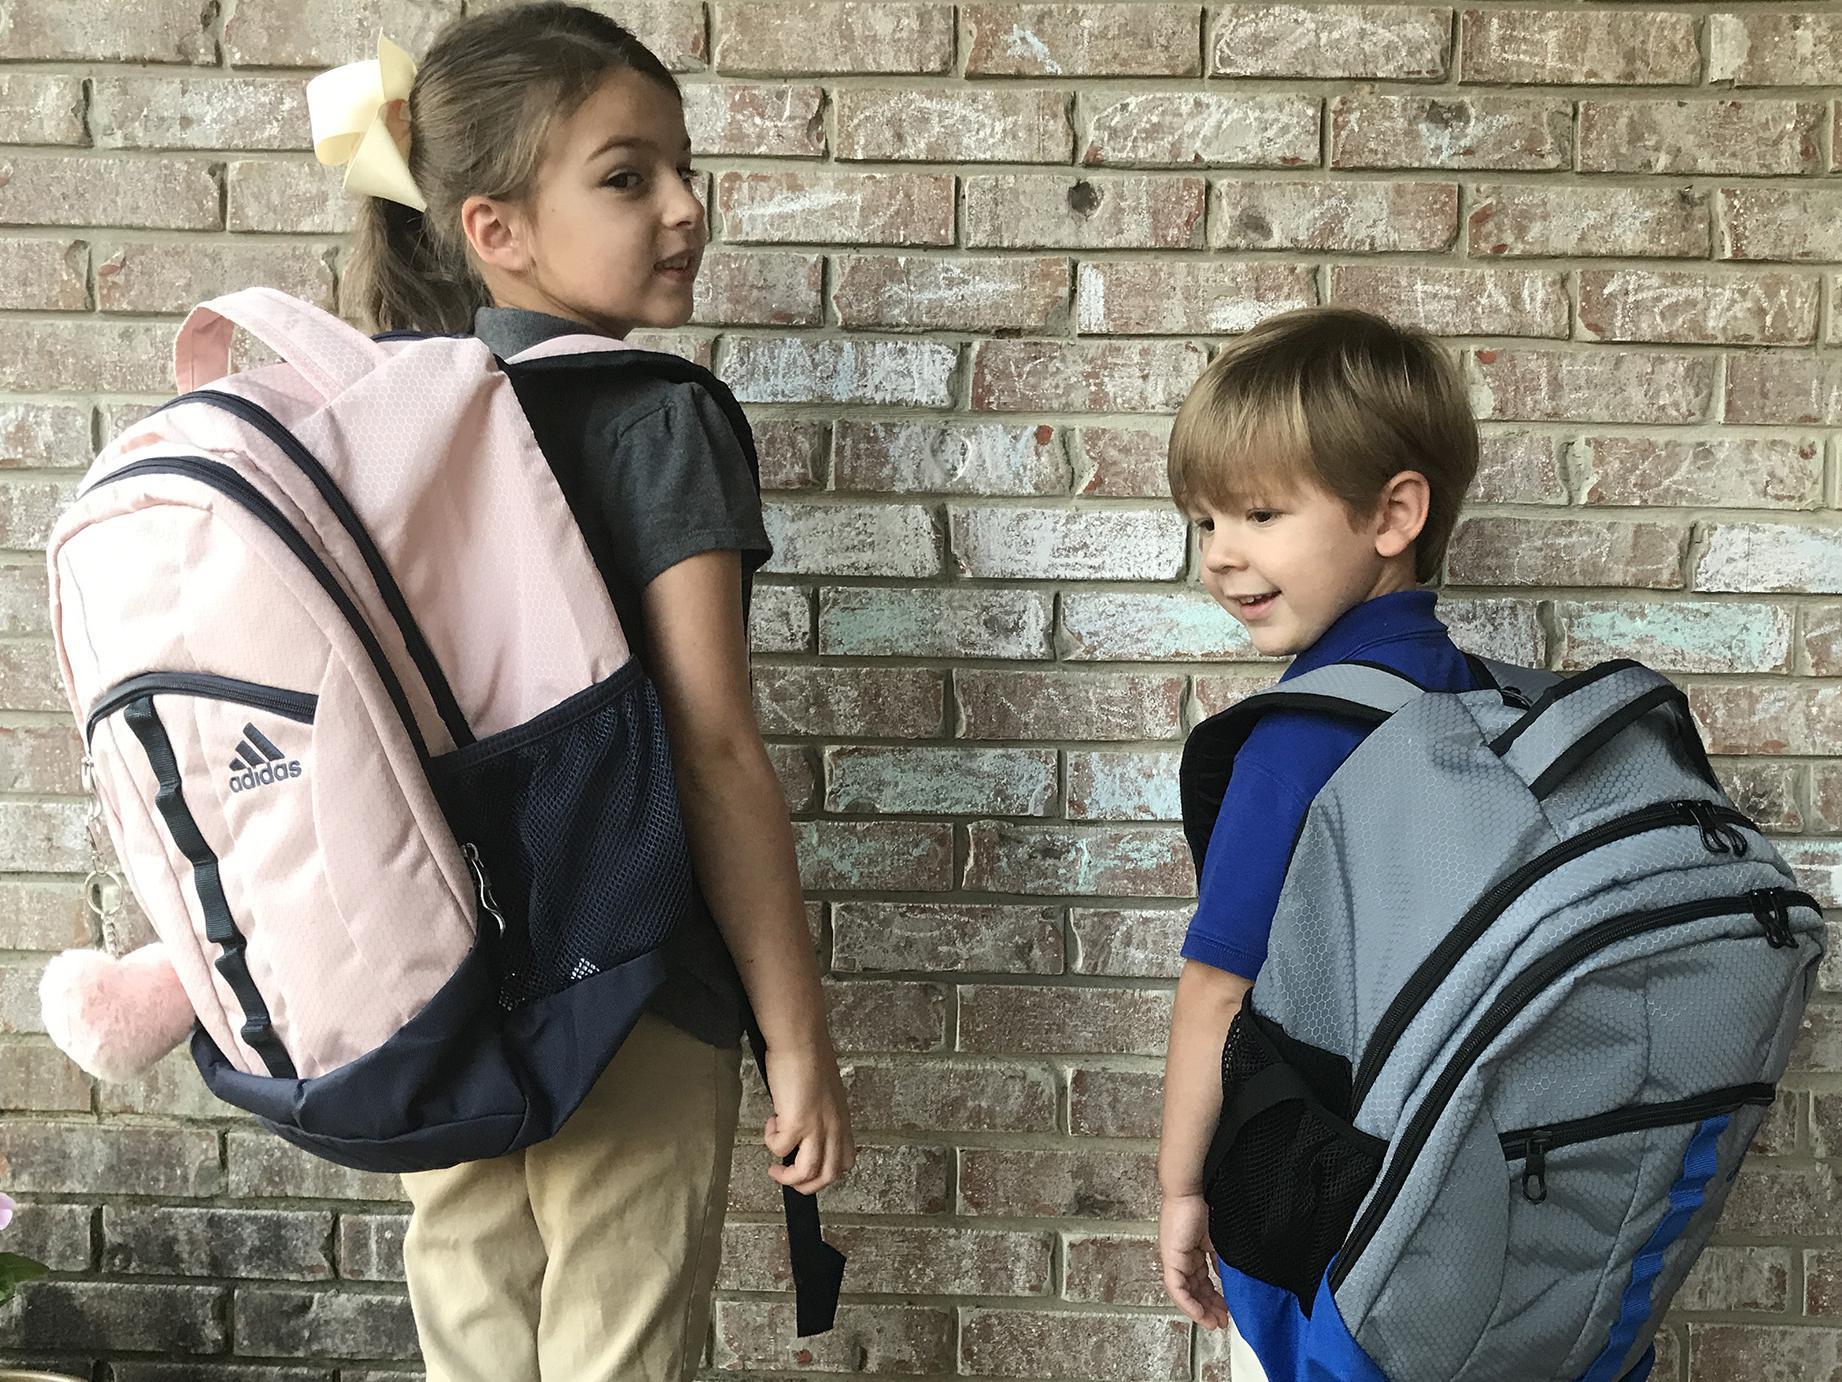 Two children with school backbacks